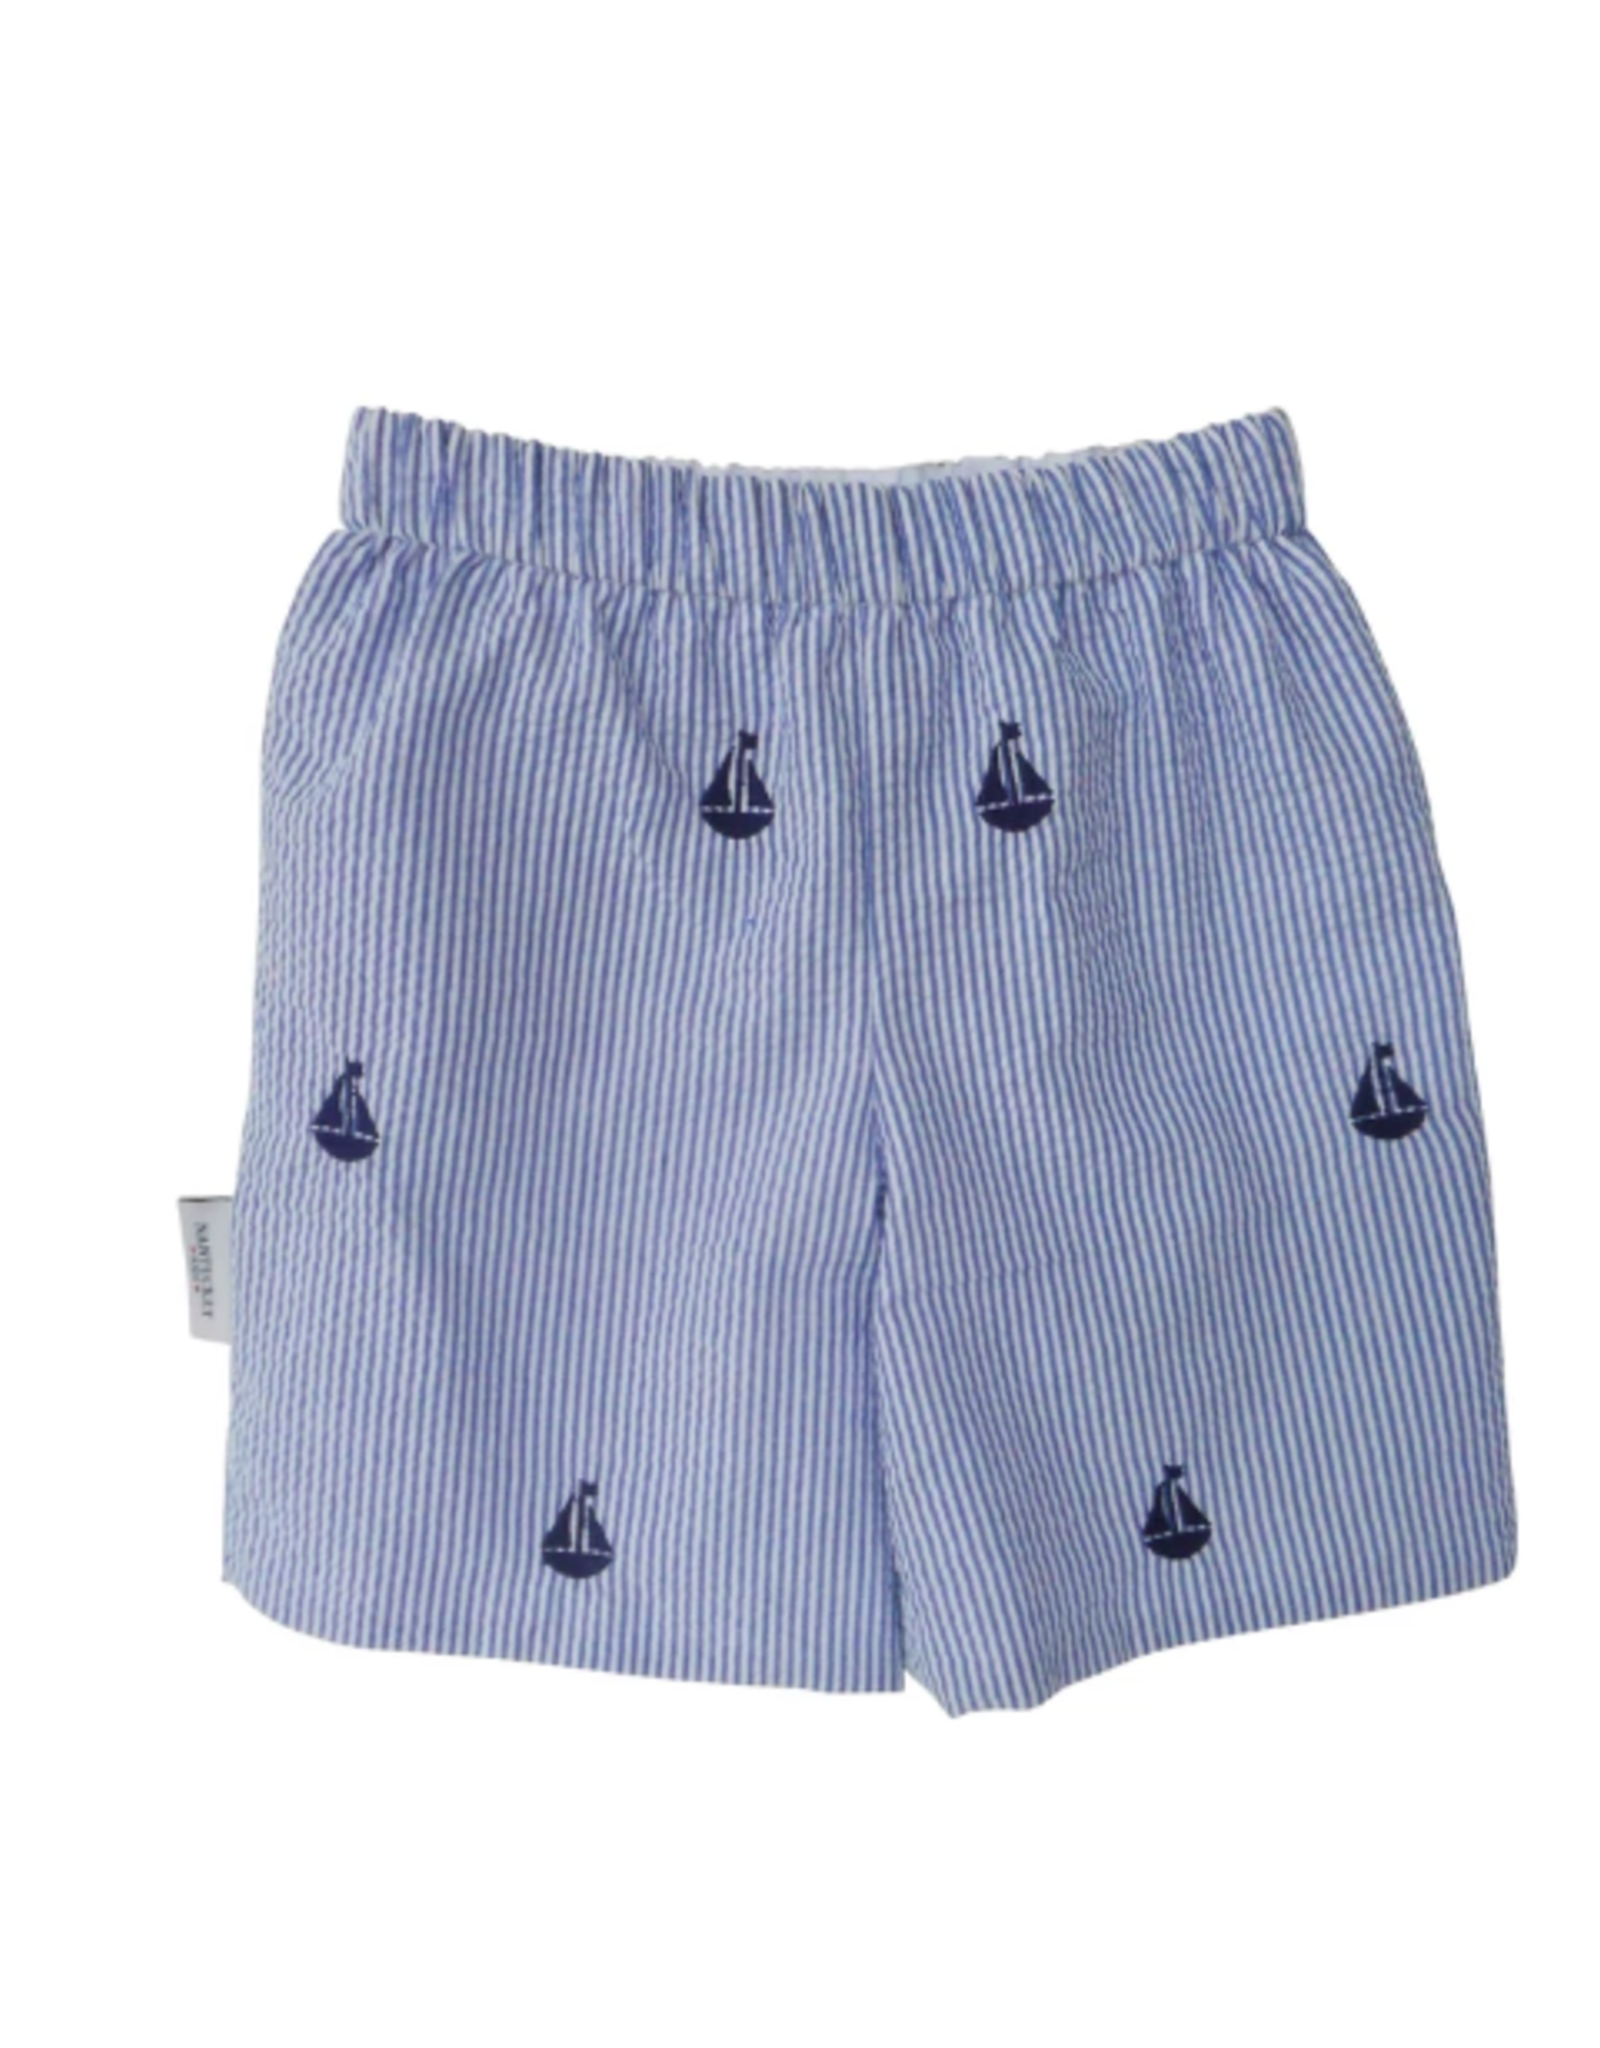 Nantucket Kids Set Sail Seersucker Shorts